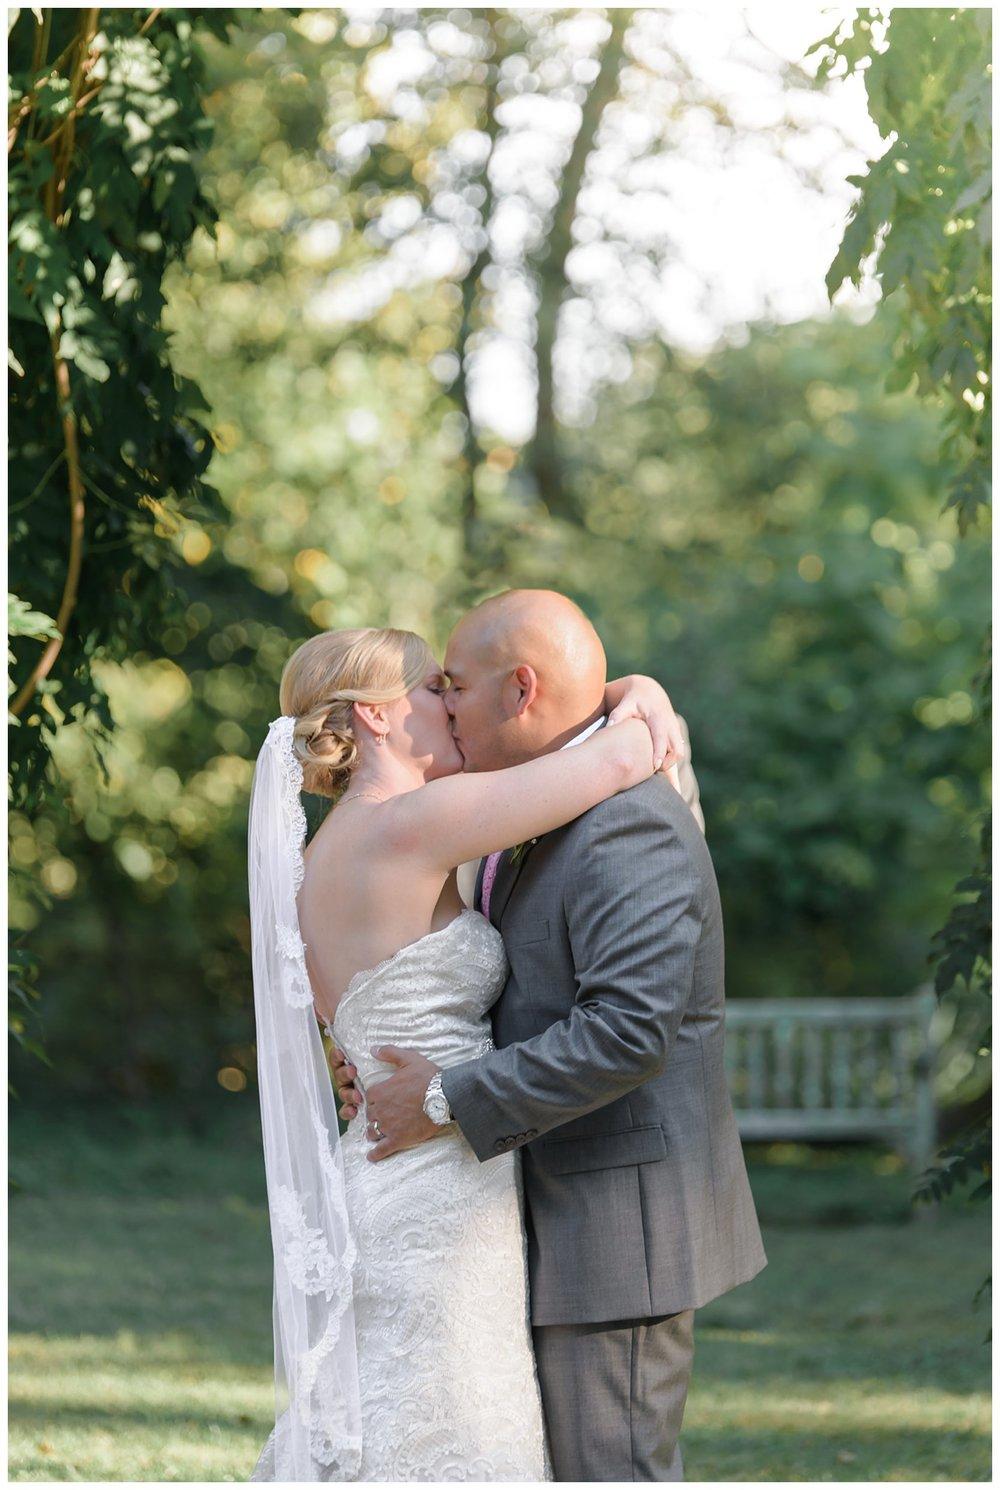 Jose-and-Jacqui-Hendry-house-arlington-virginia-wedding-photographer-charleston-south carolina-wedding-photographer-navy-blue-pink-sunset-wedding-outdoor-earthy-eco-friendly-photographer-viginia wedding--542.jpg